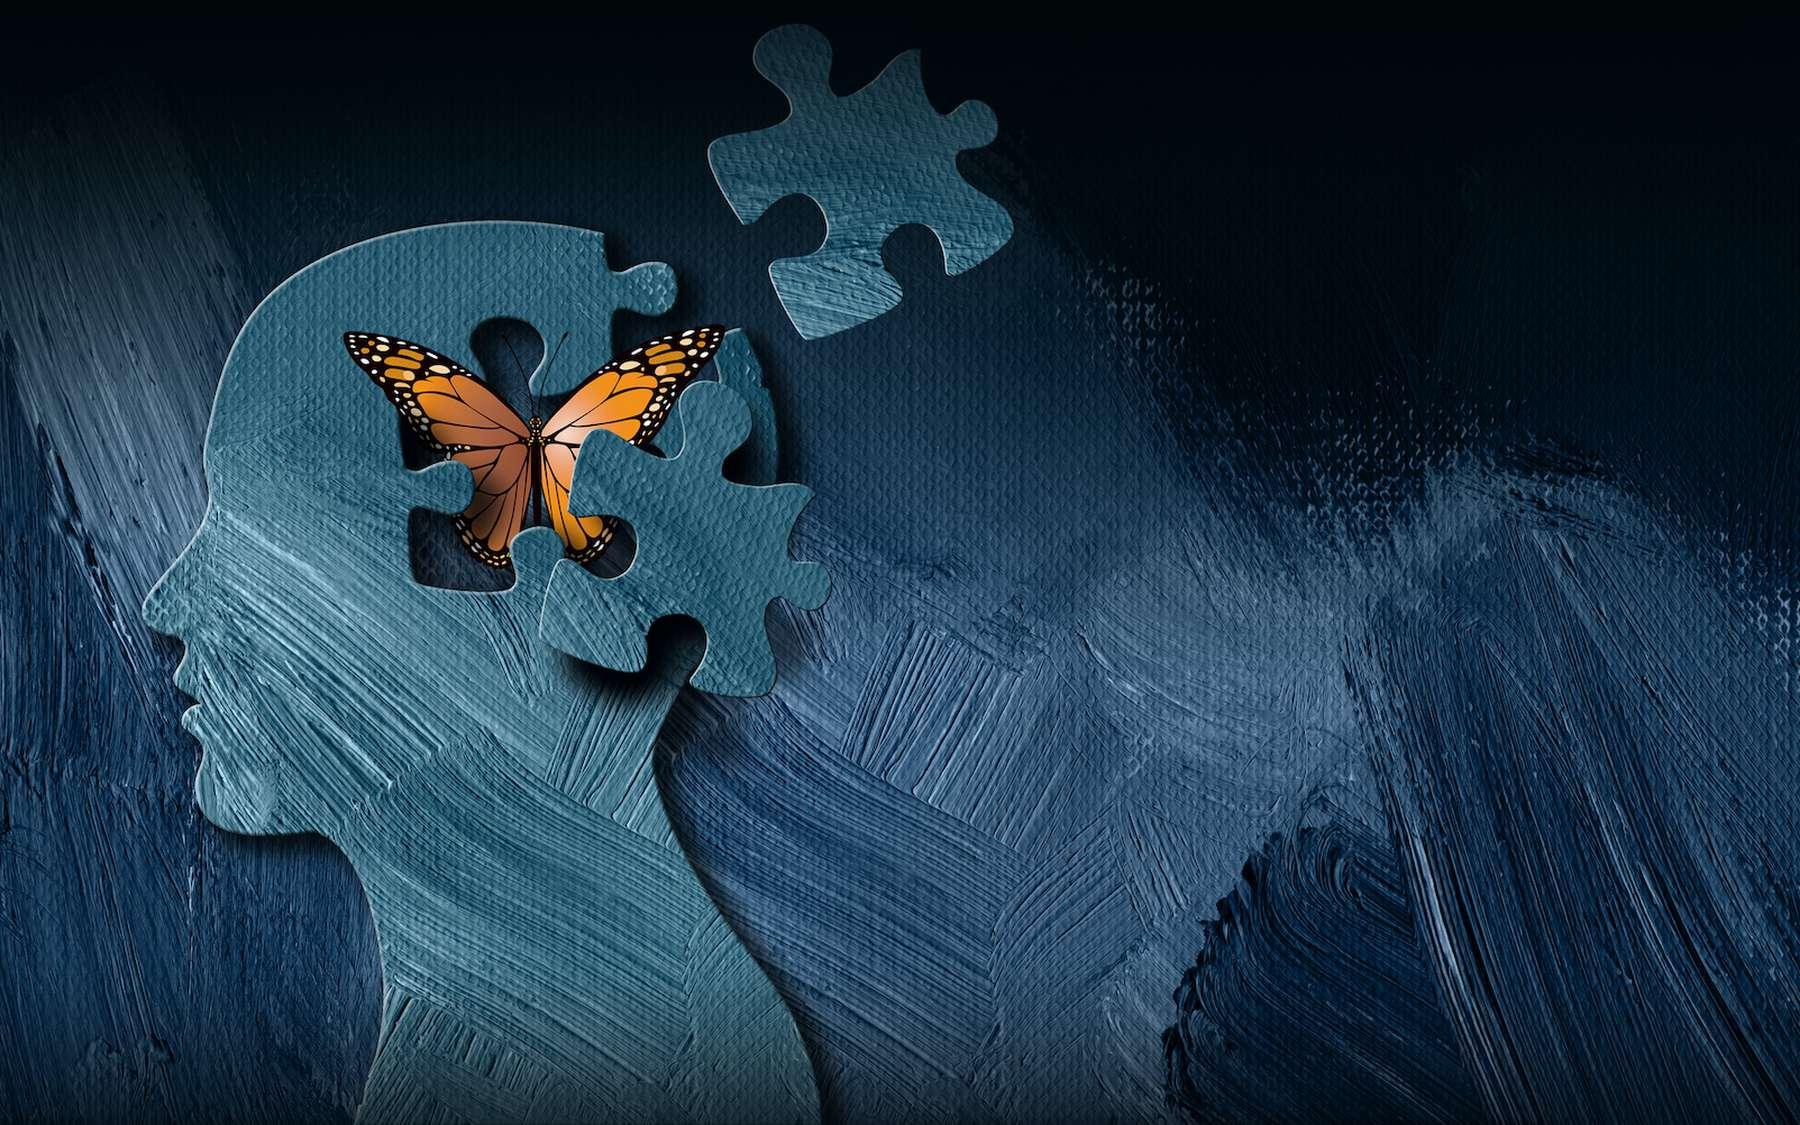 Dépression : la comprendre et s'en sortir. © gdarts, Adobe Stock